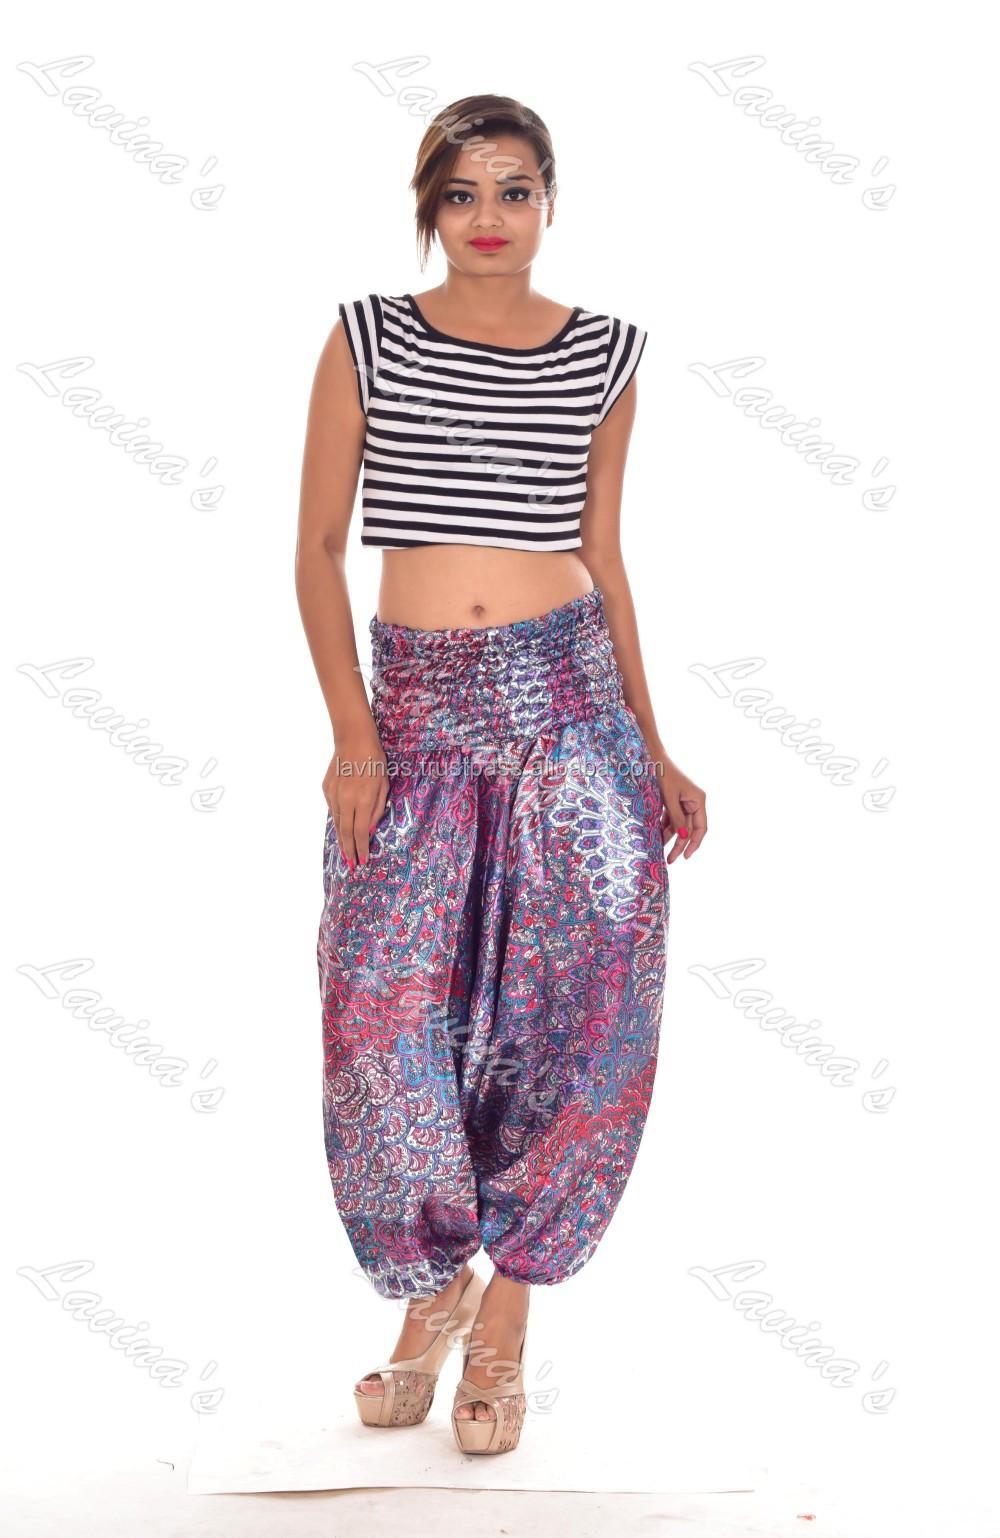 2a47221b2c9a Women Satin Yoga Pants Casual Hippie Boho Trousers Genie Alibaba ...